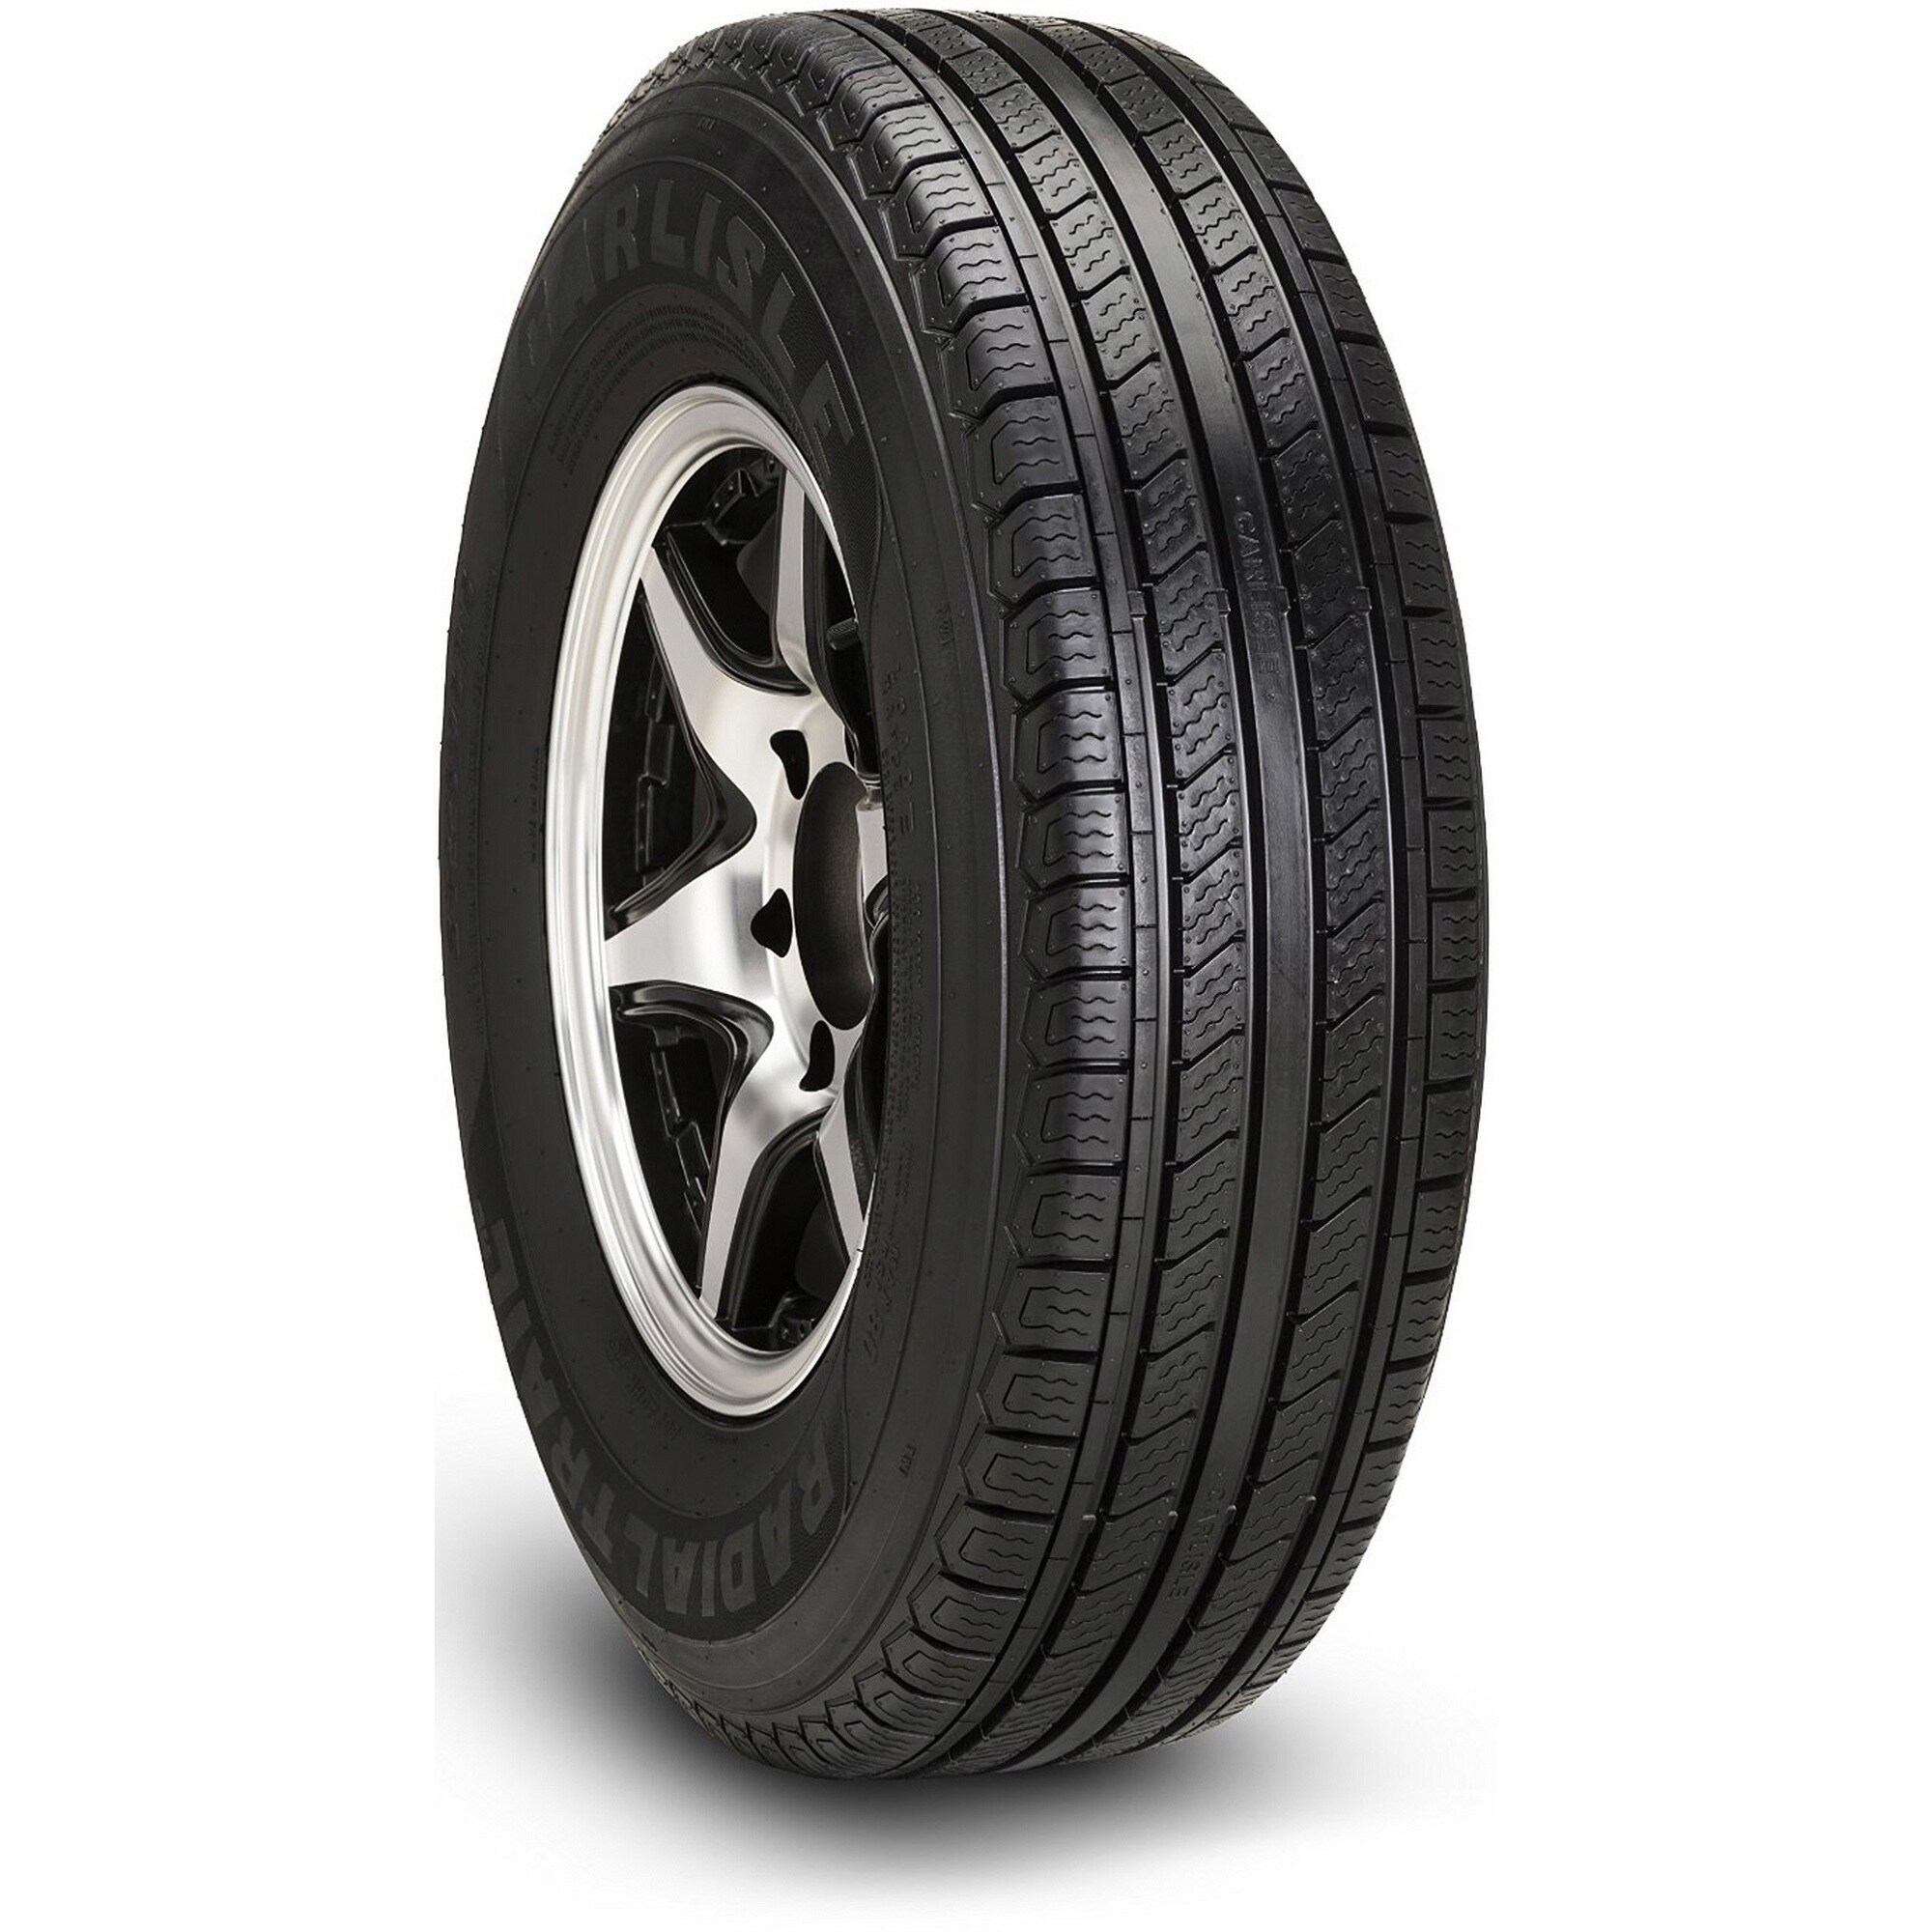 Carlisle Radial Trail HD Trailer Tire - ST175/80R13 (Black)